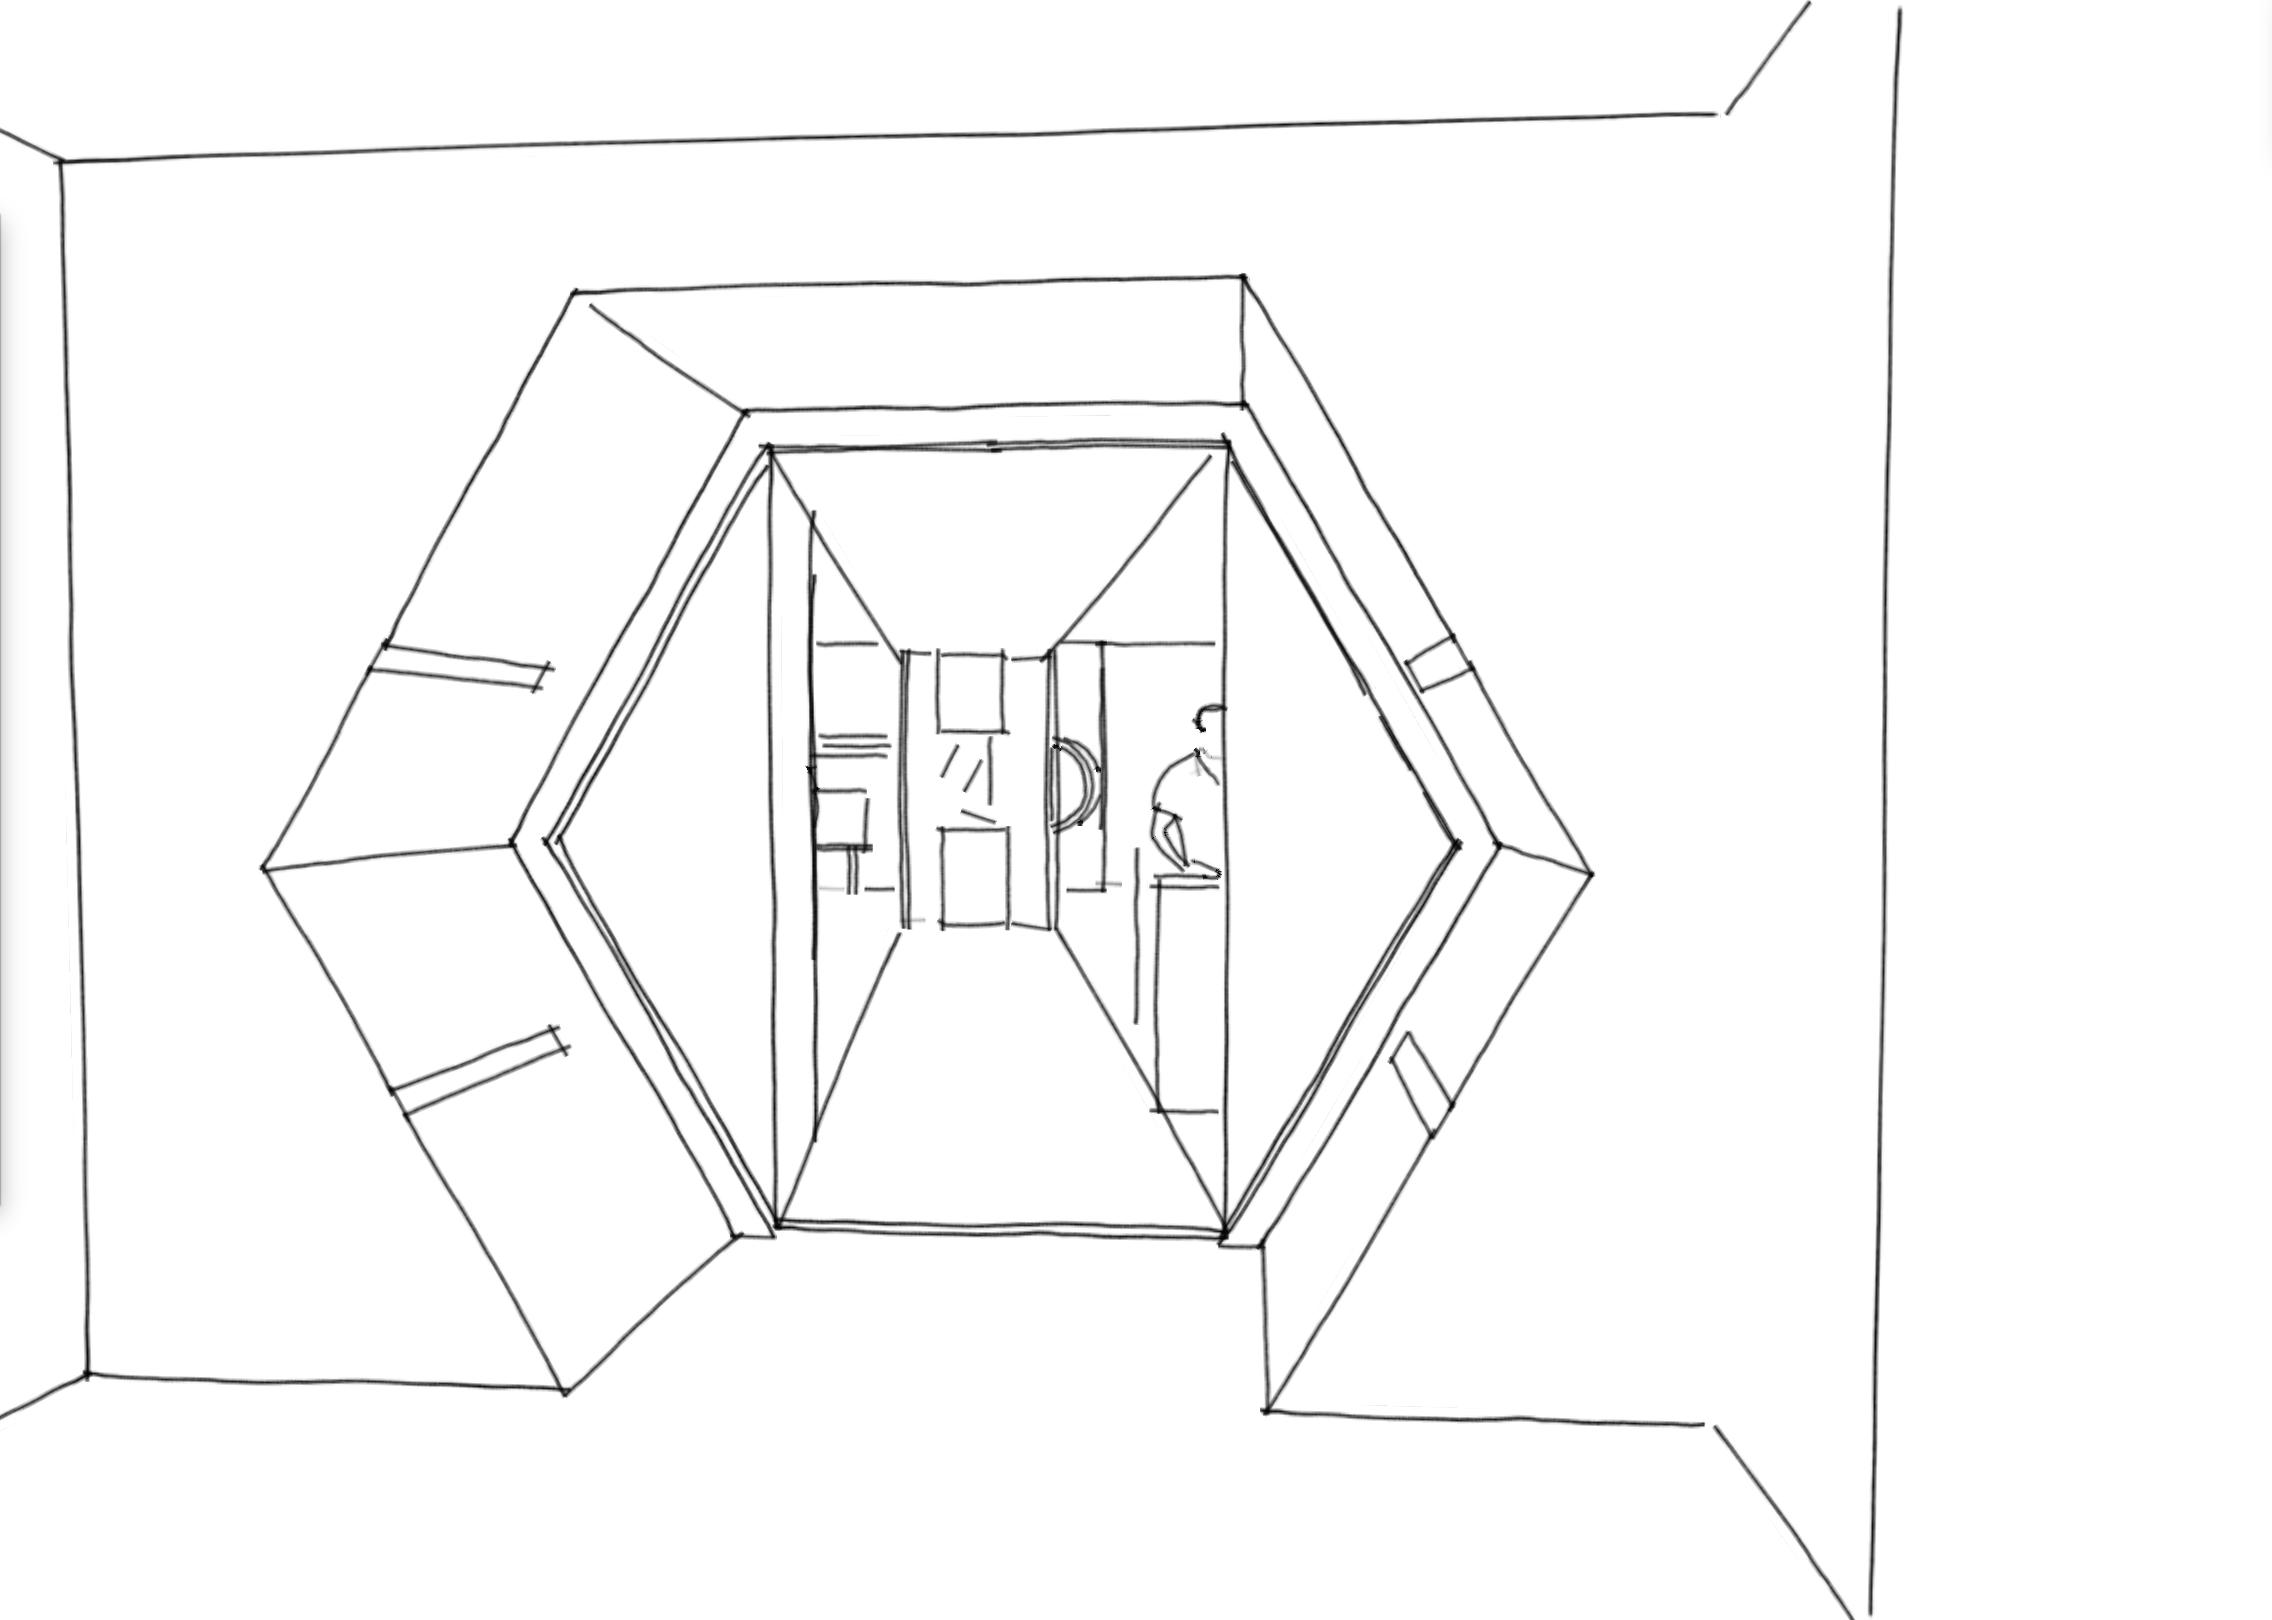 1. Immersive tunnel